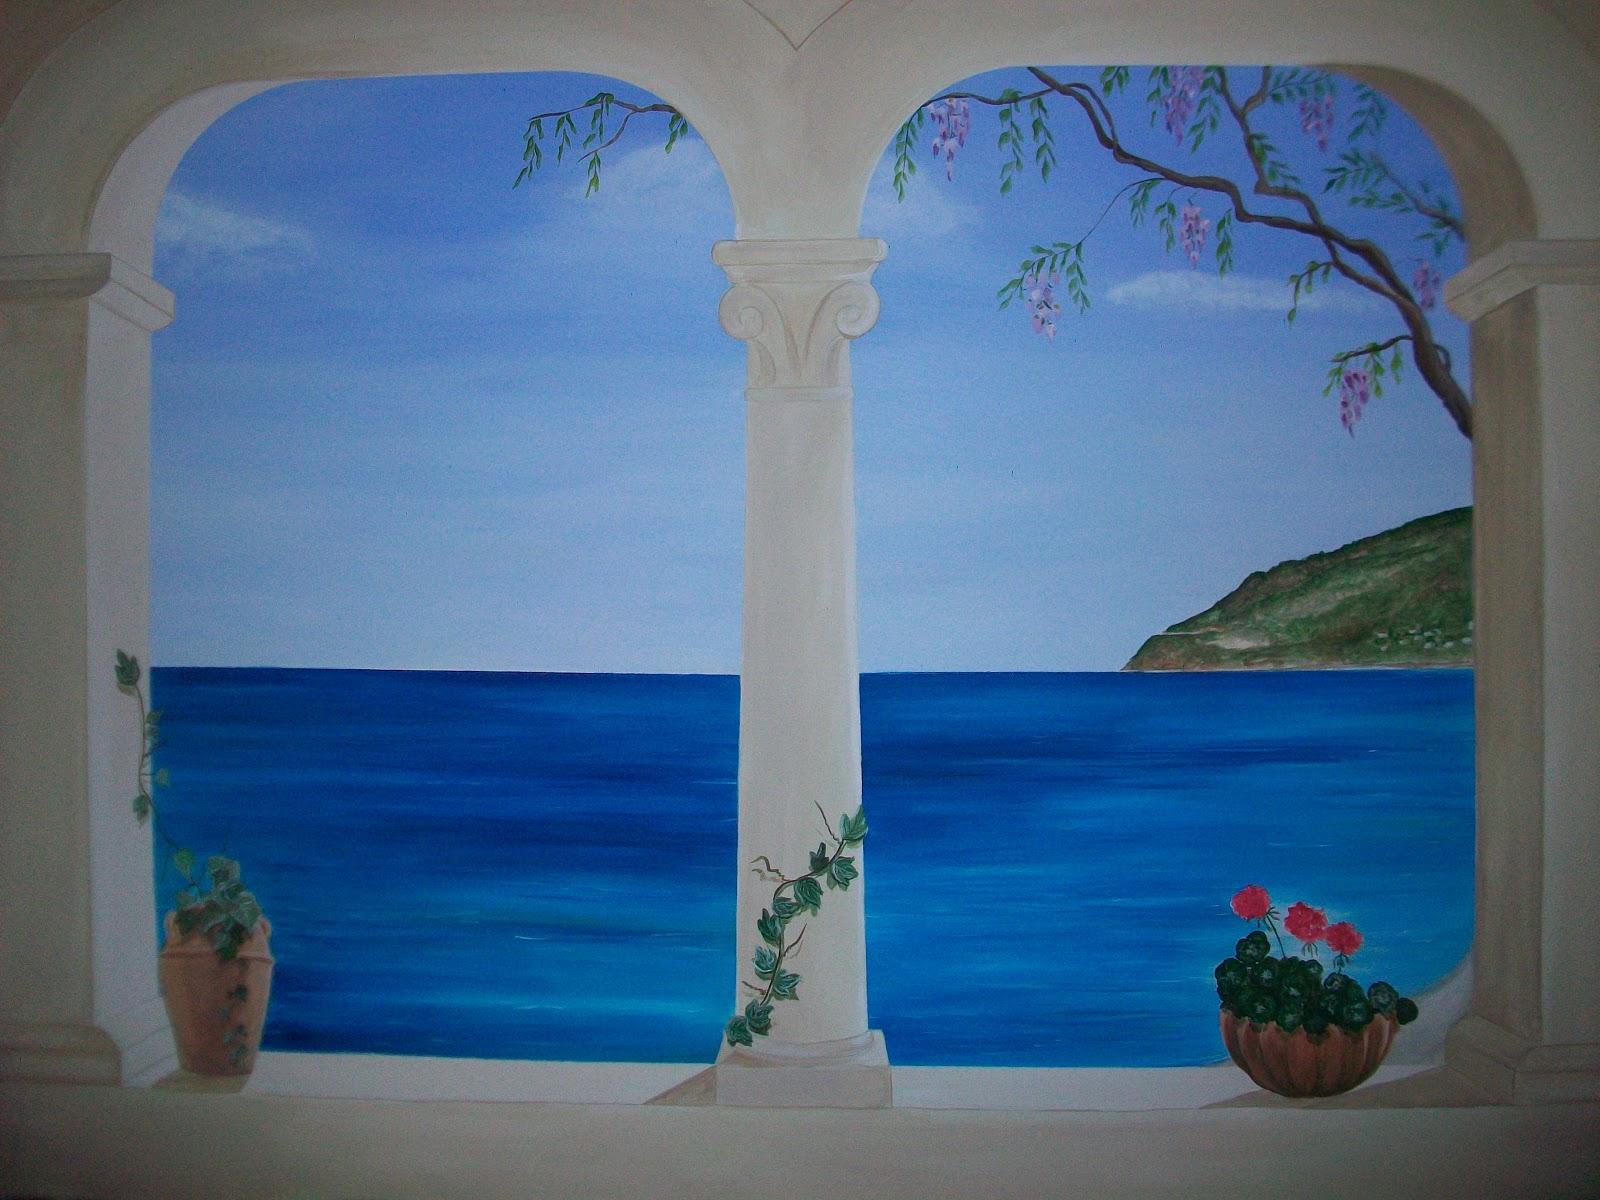 Trompe l 39 oeil murales decorazione pareti camerette - Blog decorazione interni ...